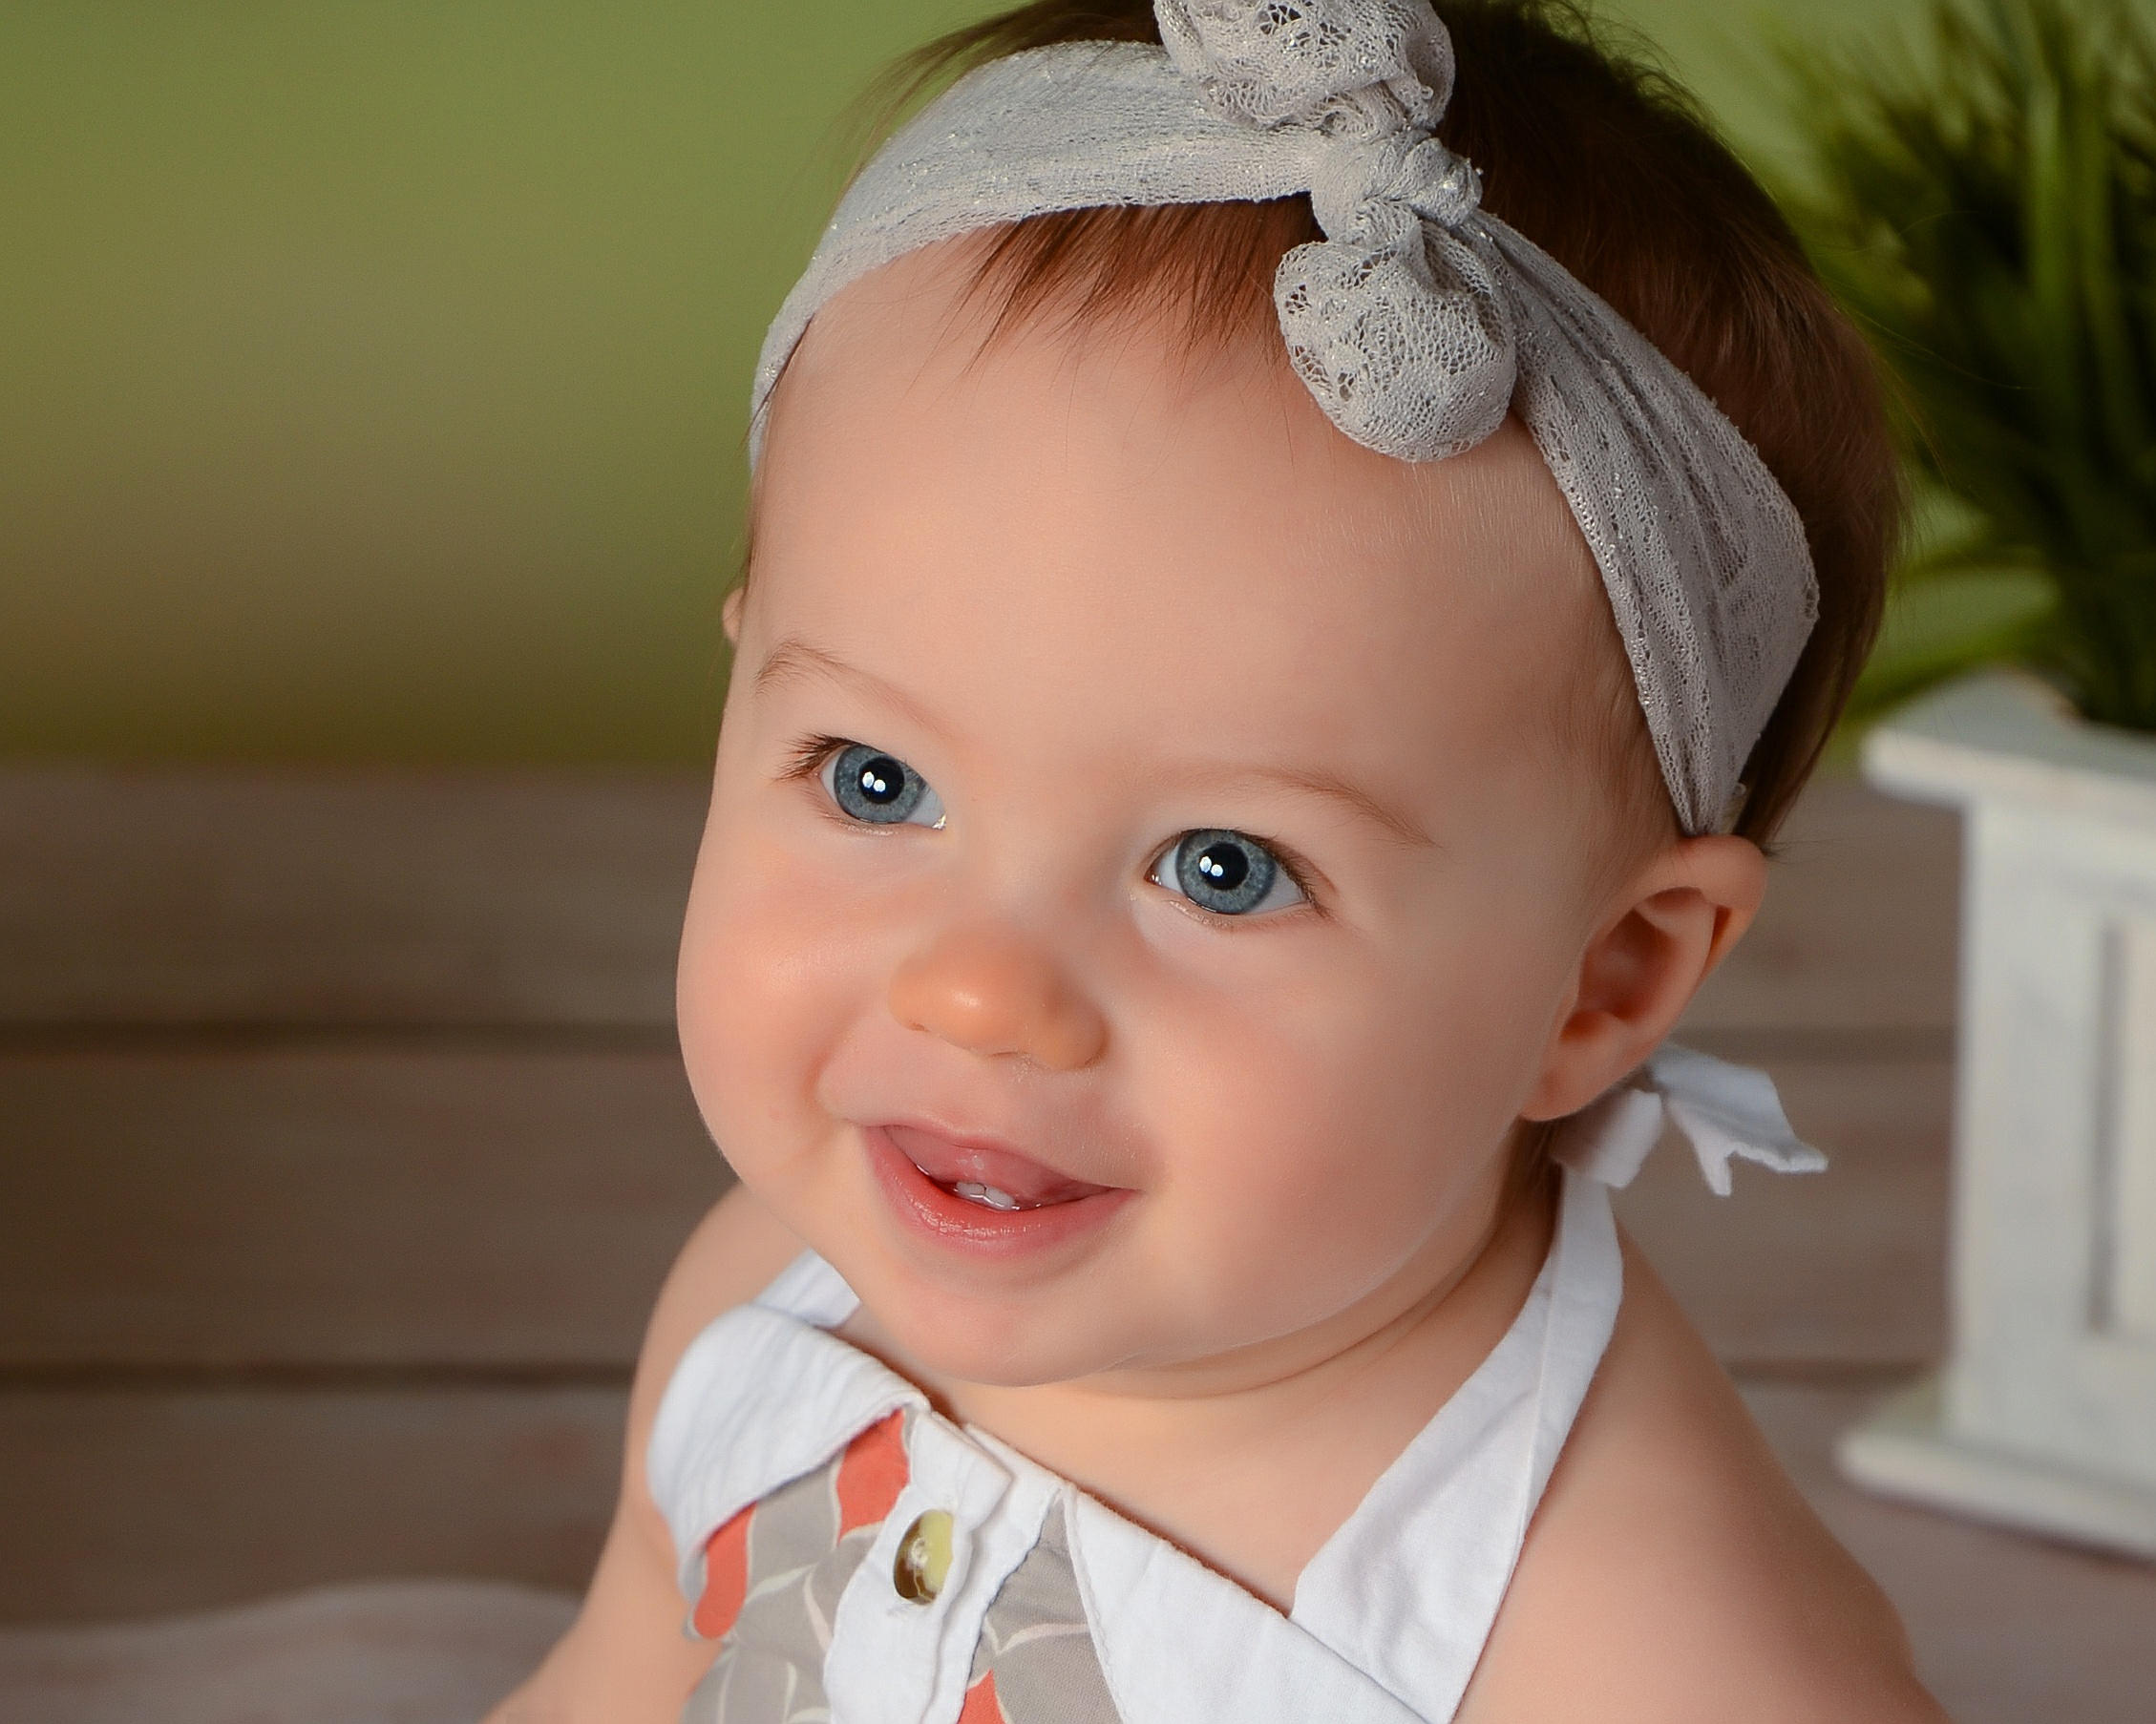 Lifetouch Preschool Photography - Sales Representative image 1